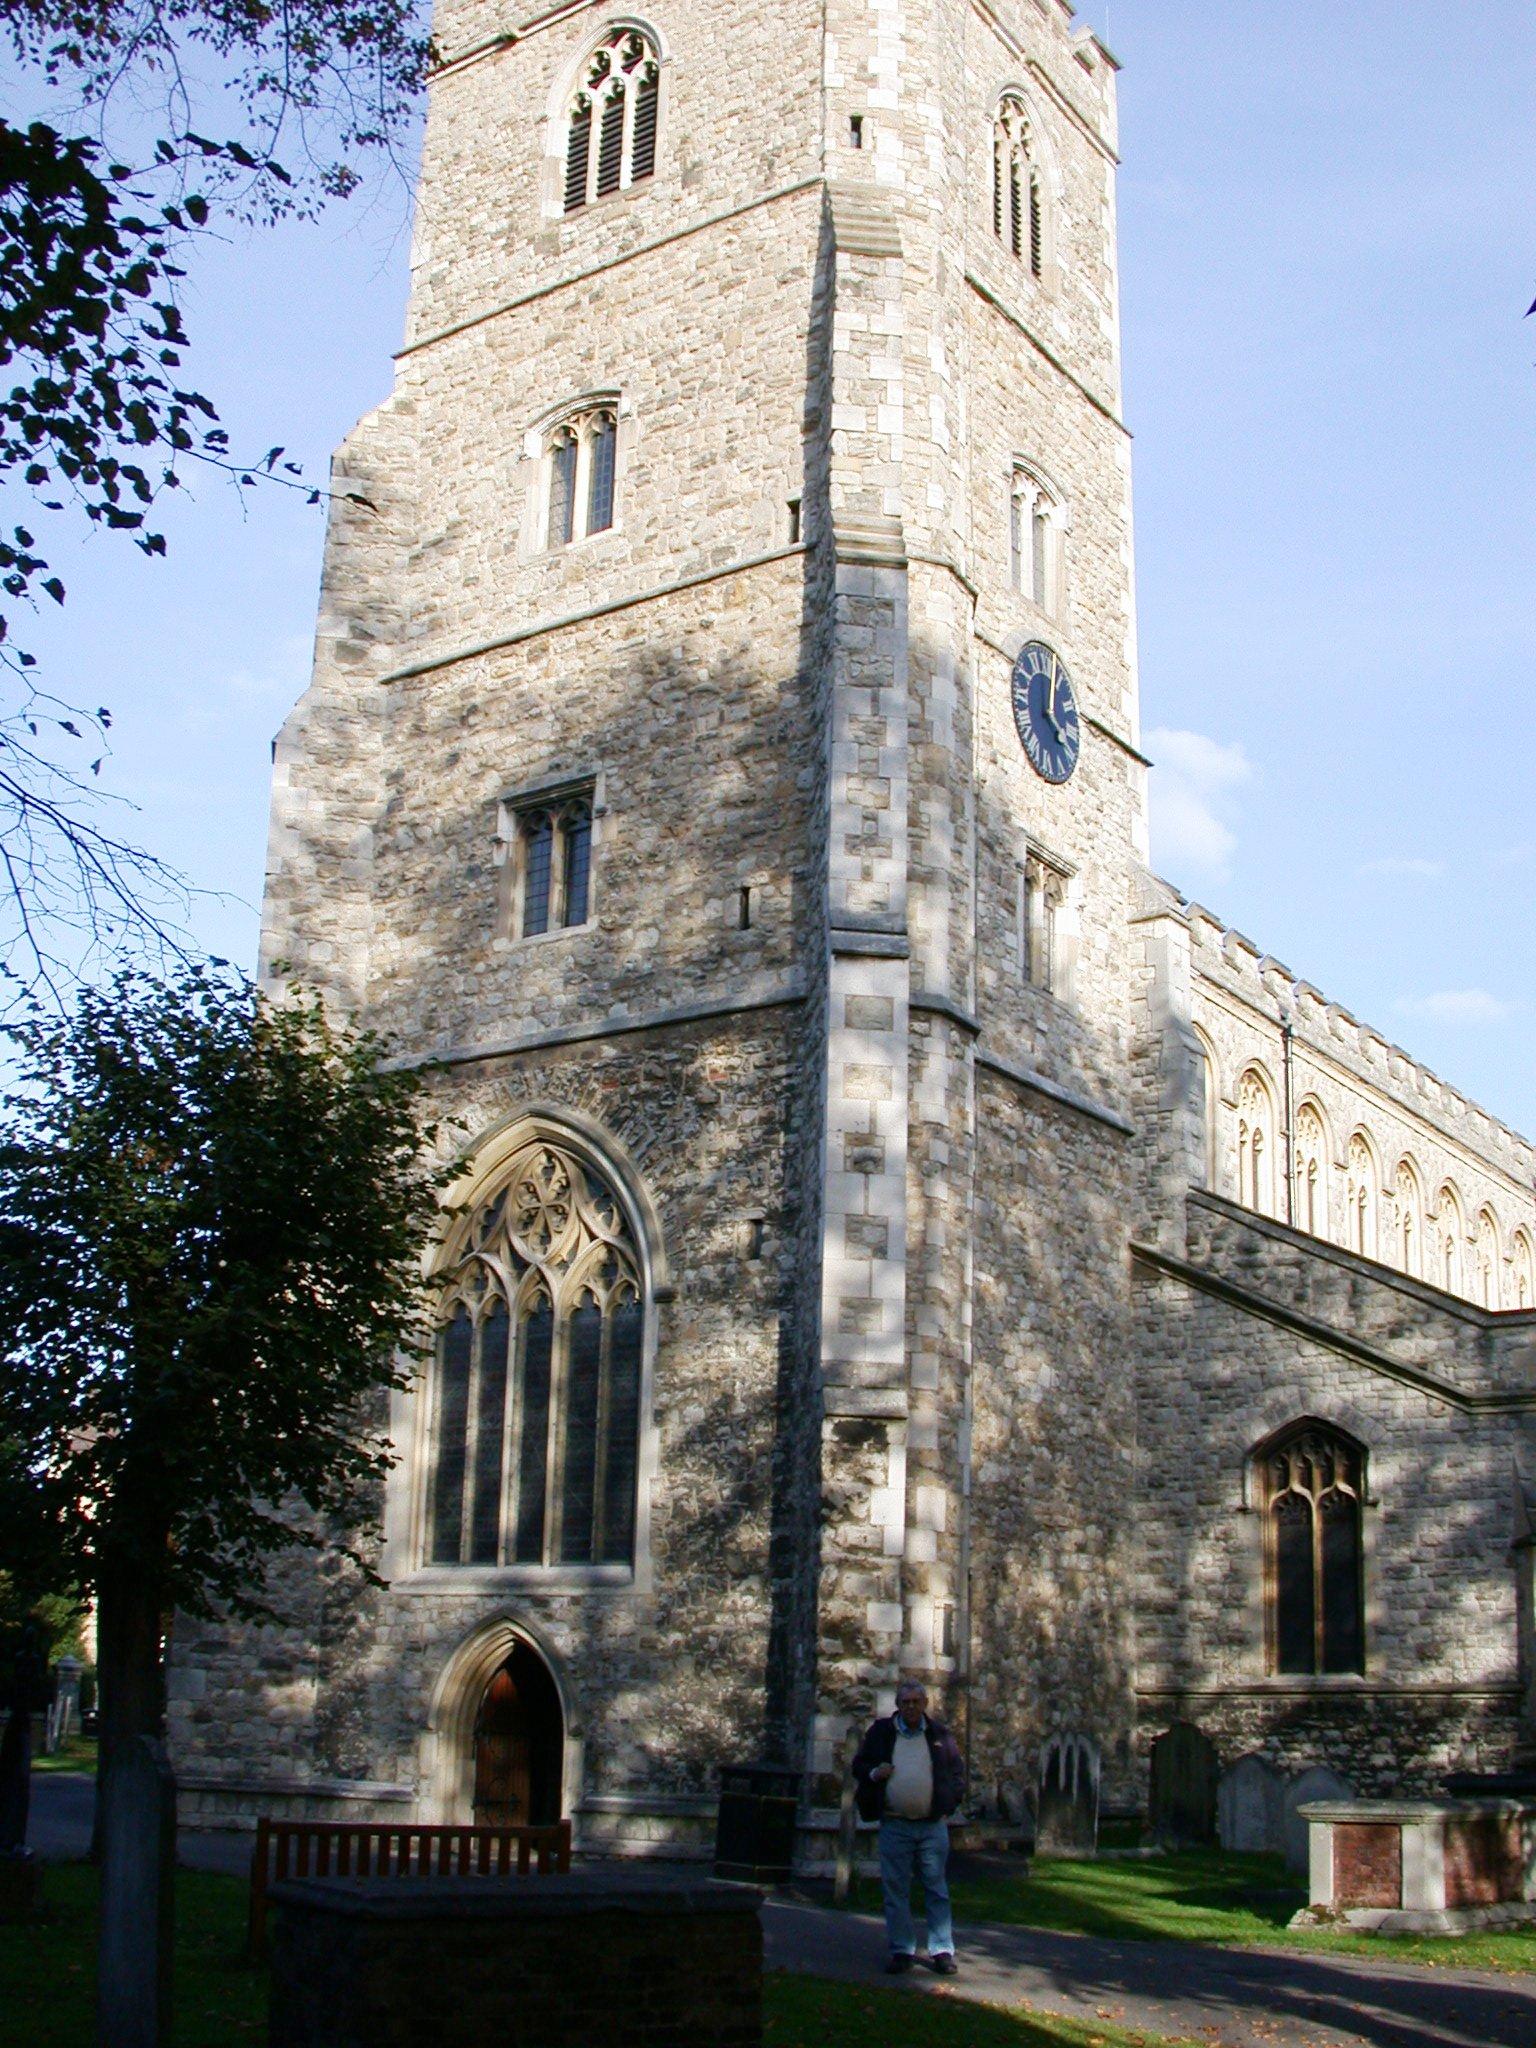 all-saints-fulham-london-england-humphrey-henchman-bishop-of-london-jpg